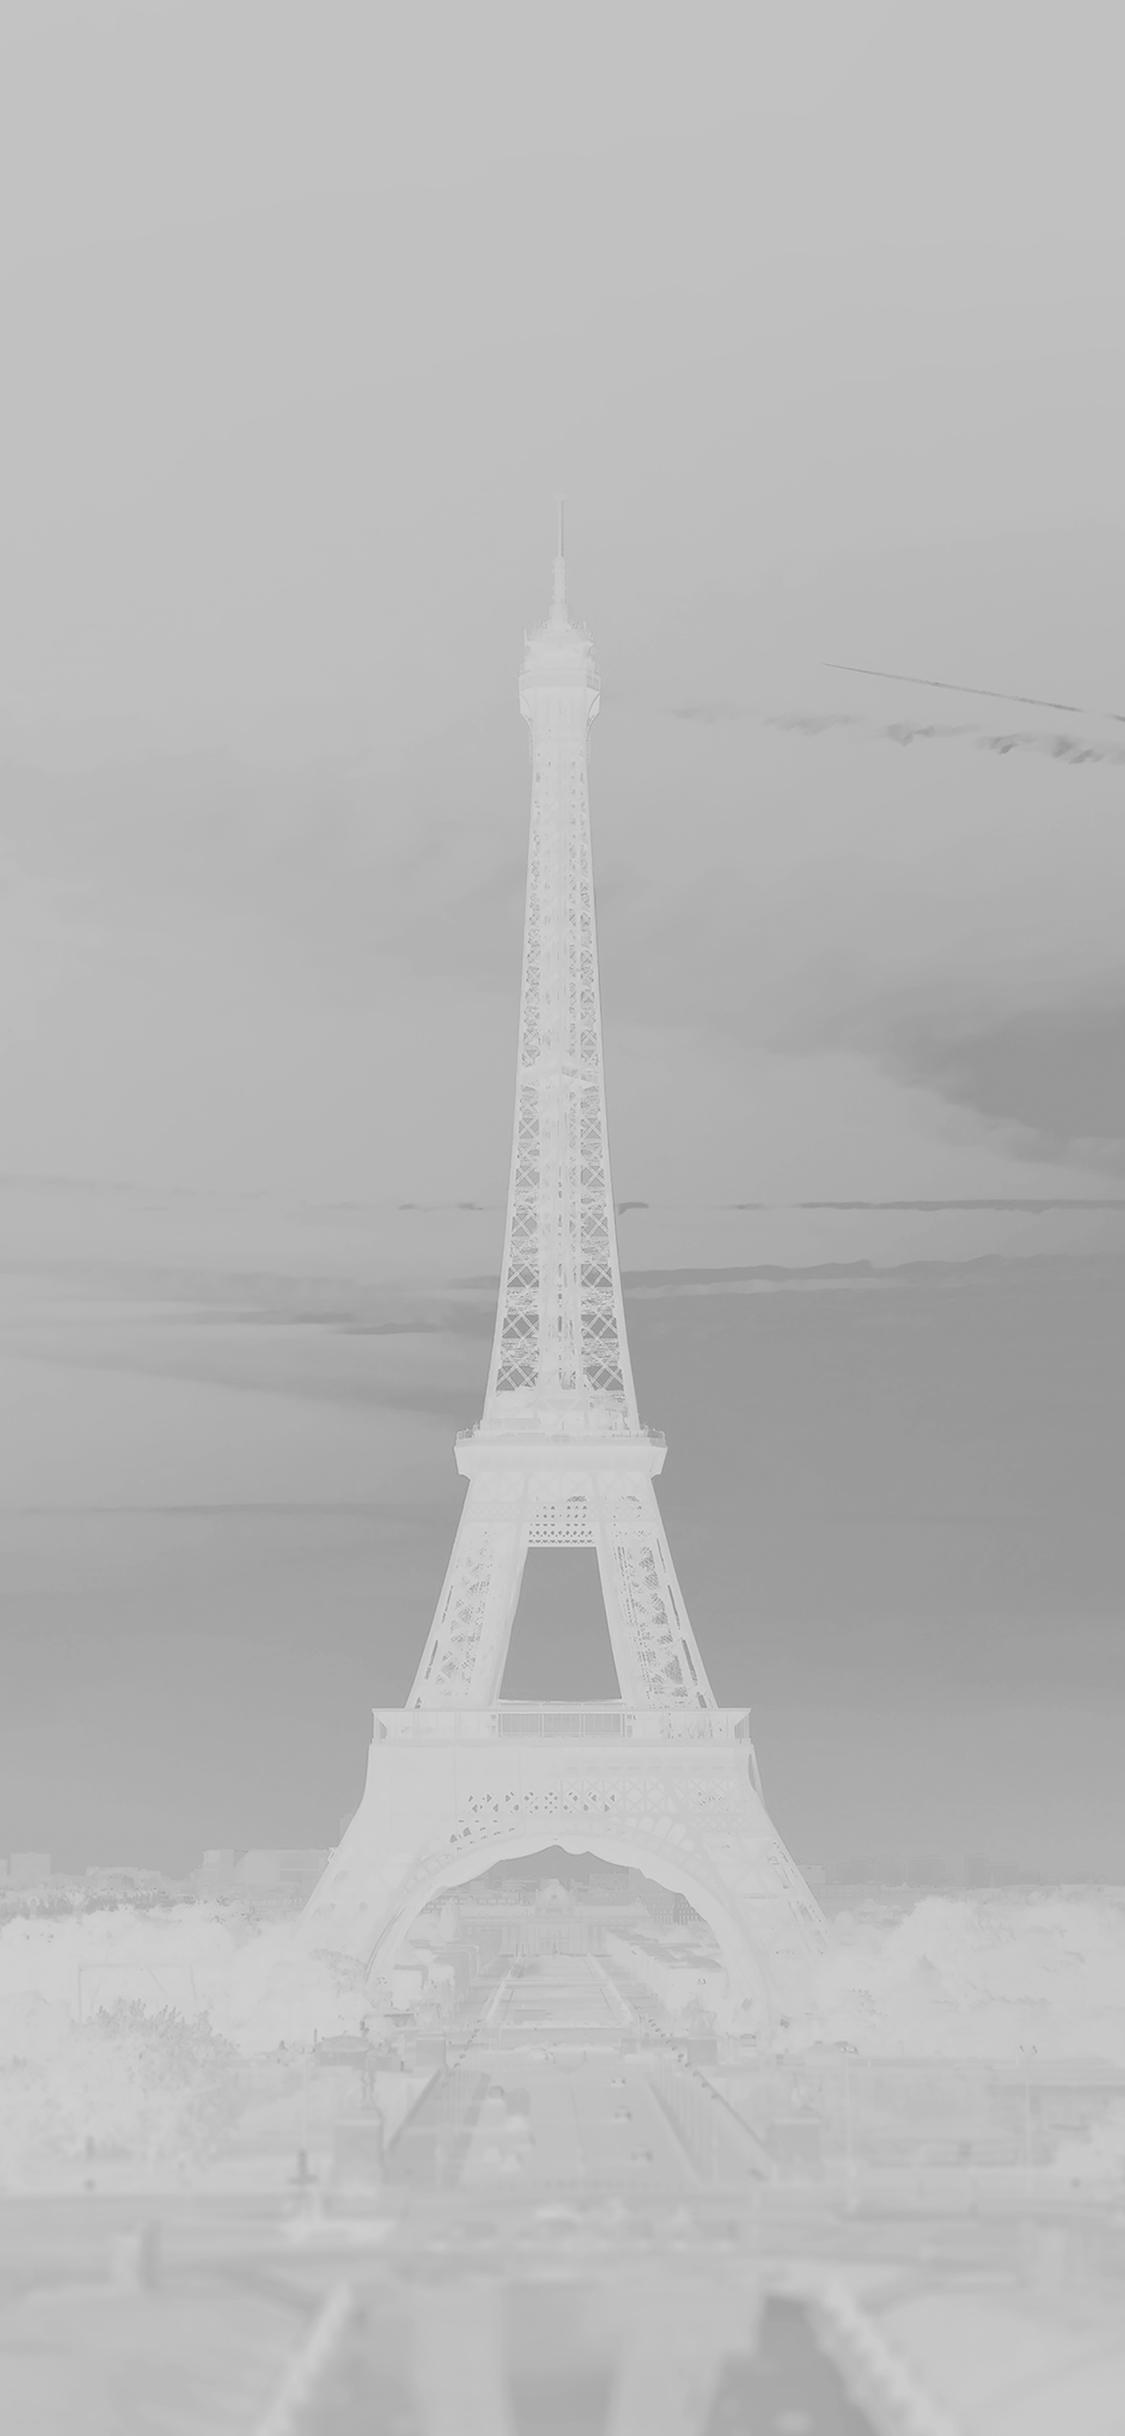 Music Mg Wallpaper Hd Mg42 City Of Love Paris Eiffel Tower France White Wallpaper